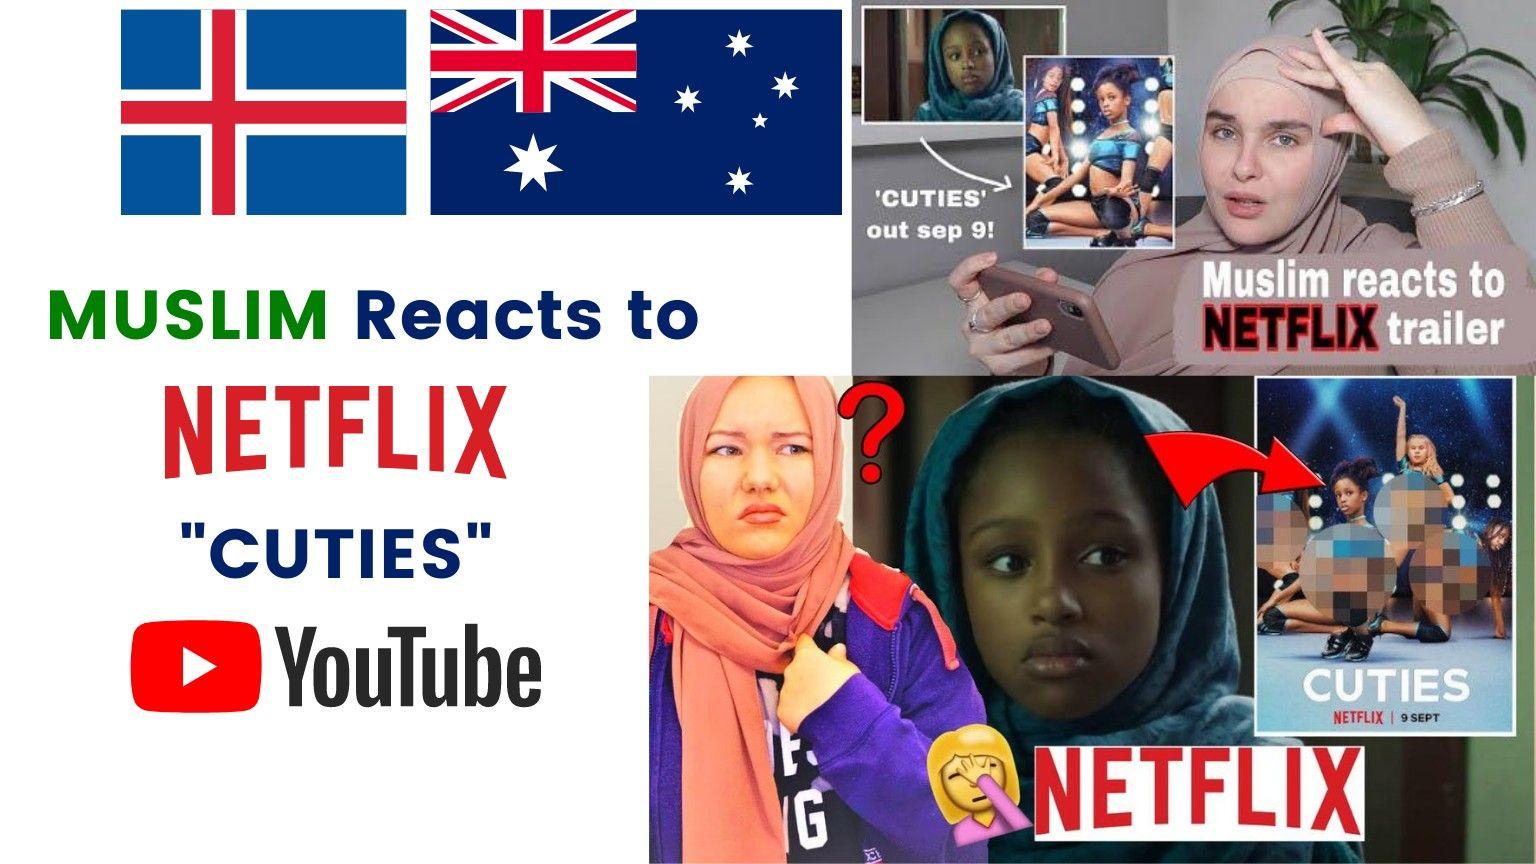 MUSLIM REACTS TO NETFLIX CUTIES TRAILER! | Samantha J Boyle 🇦🇺 | Anna B 🇮🇸